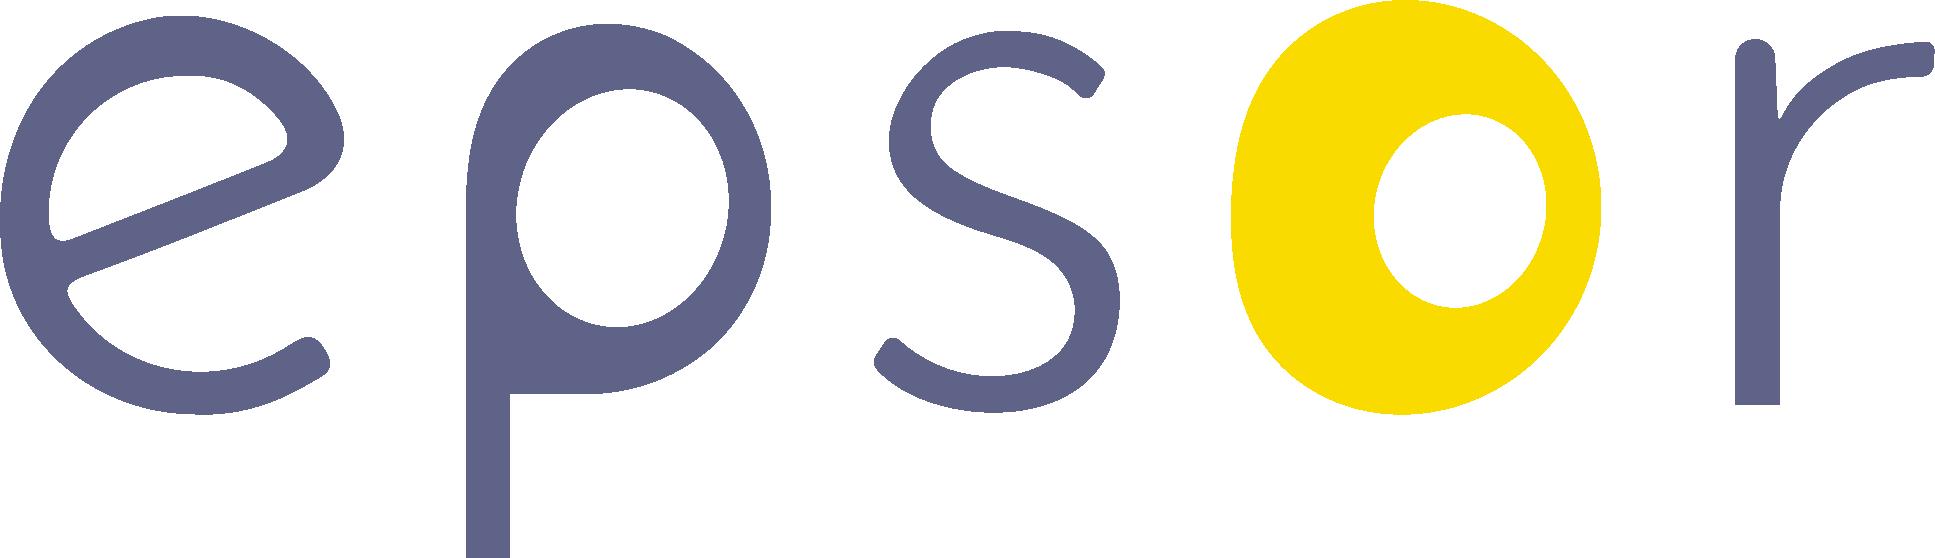 logo_epsor-1